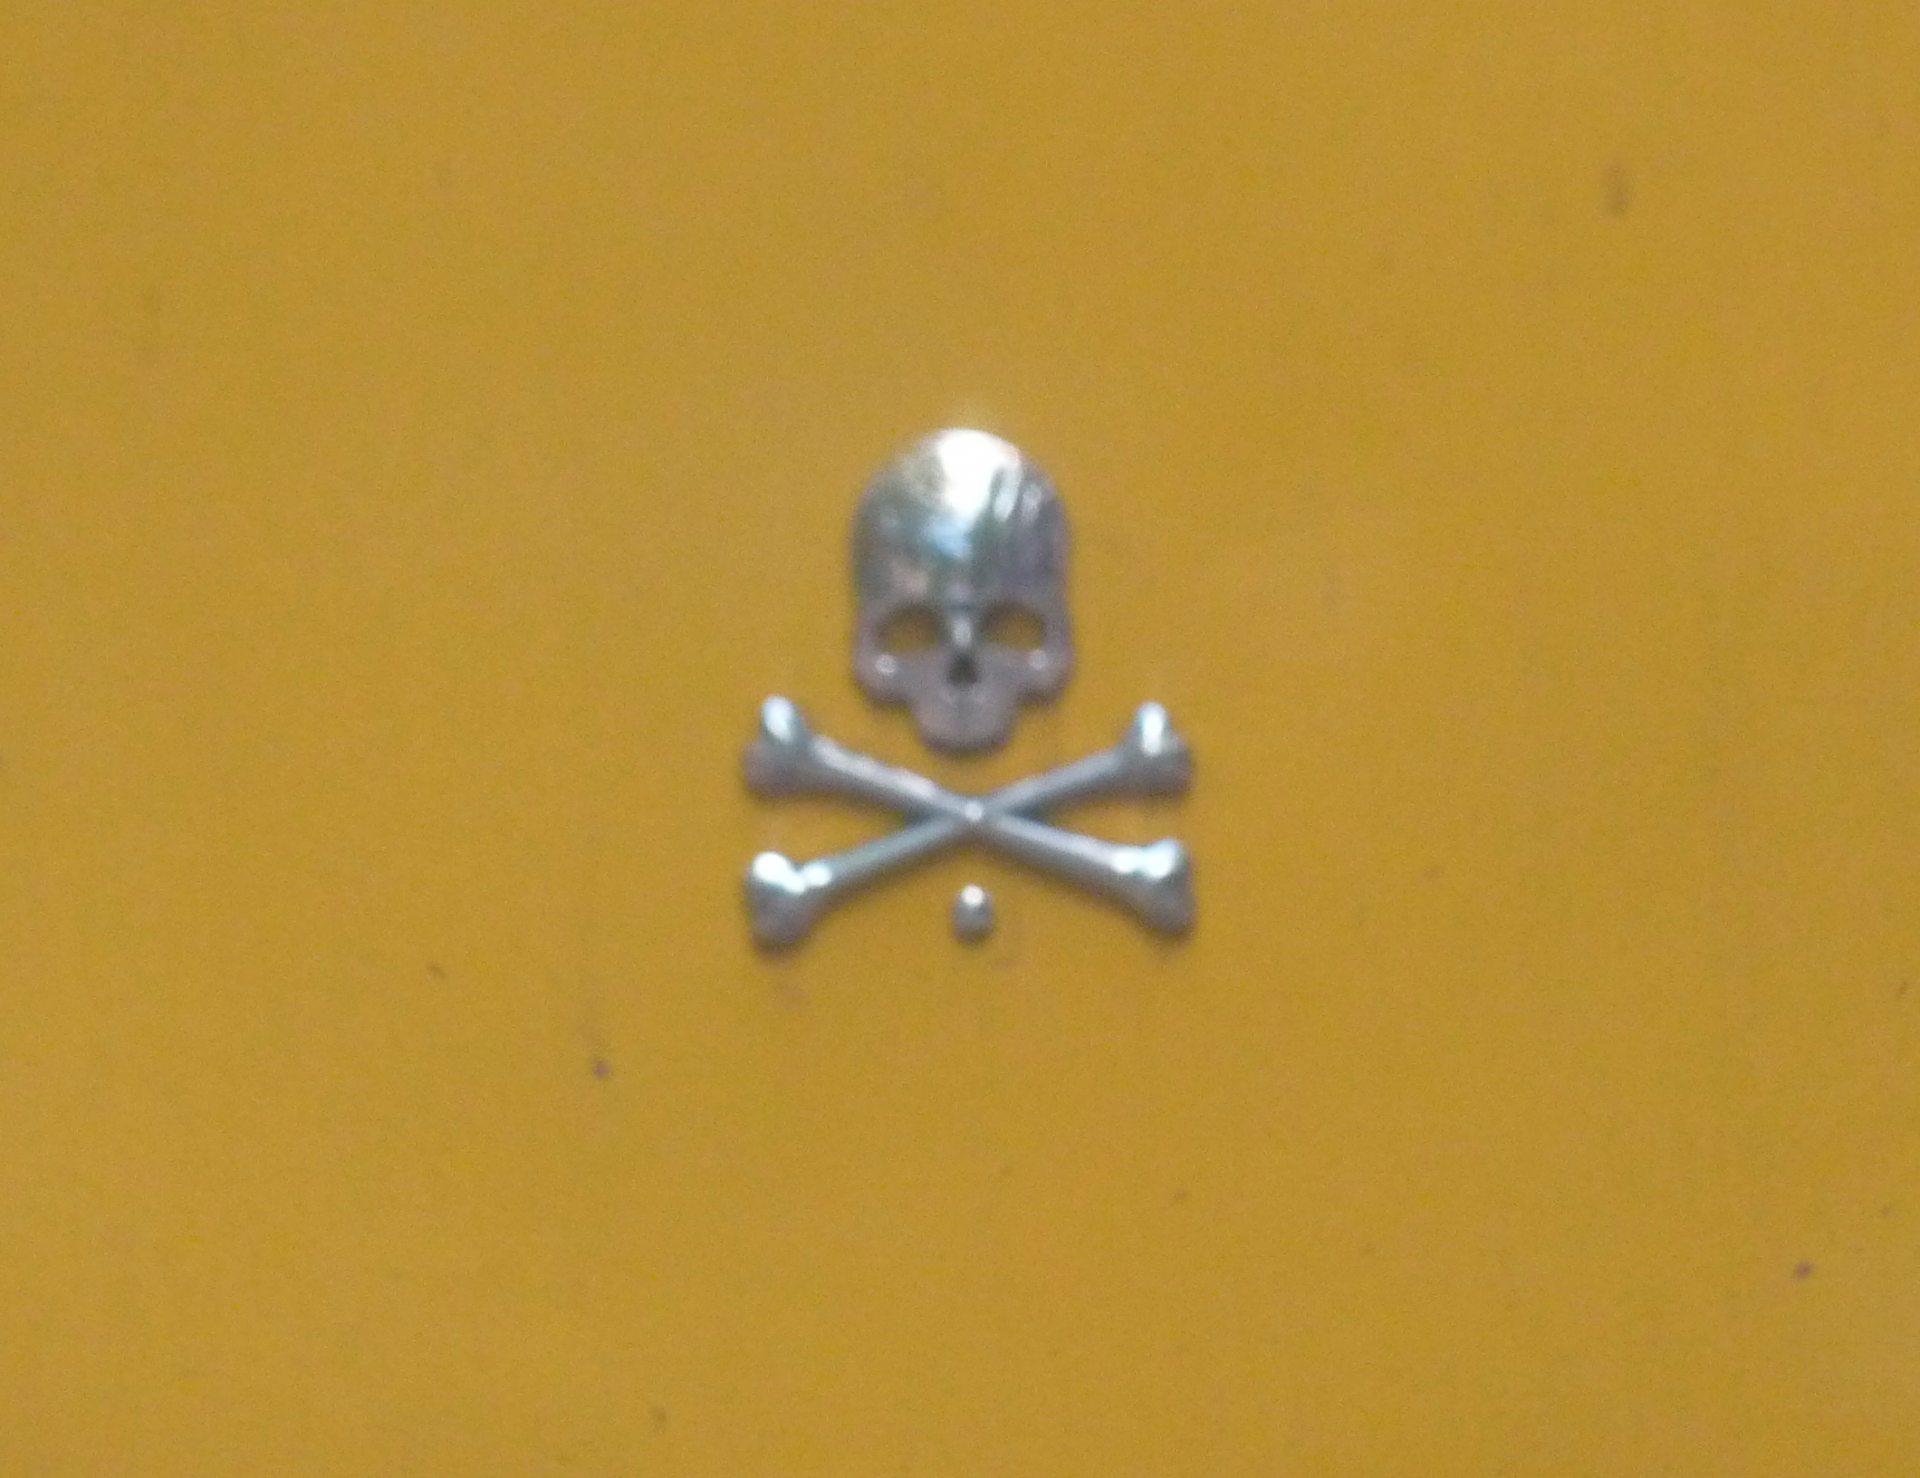 череп и кости, водитель, маршрутка